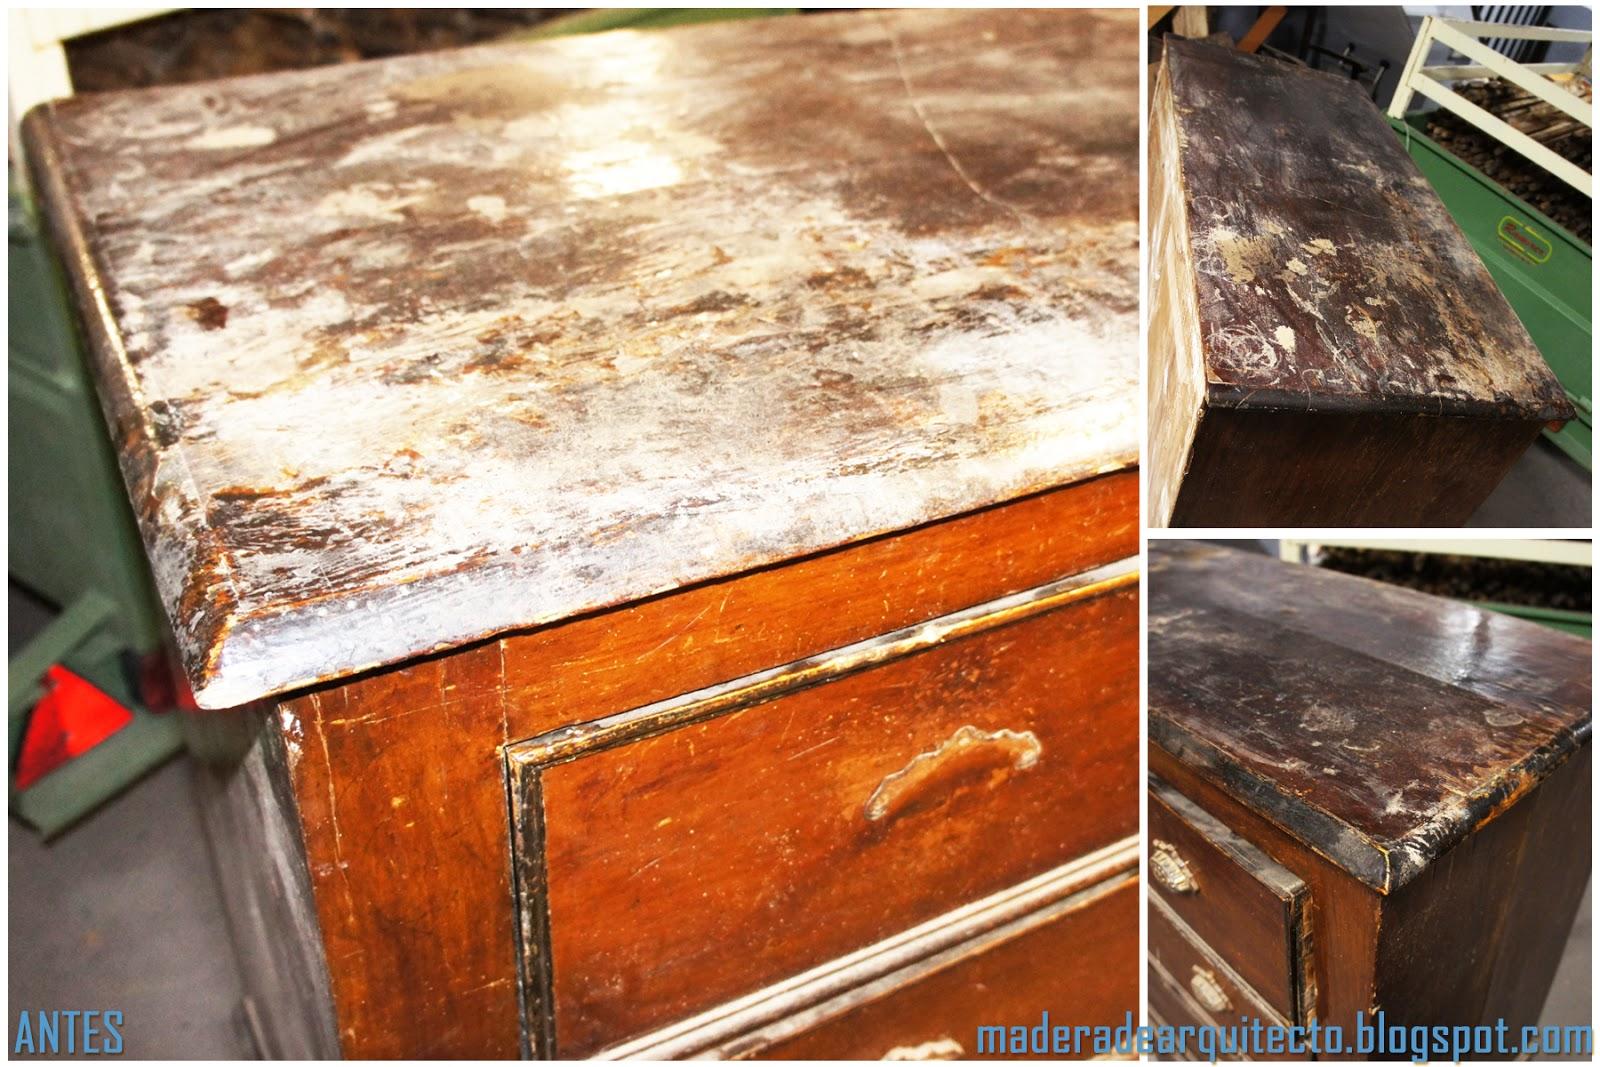 Madera de arquitecto restauraci n de muebles c moda Reparar aranazos madera barnizada